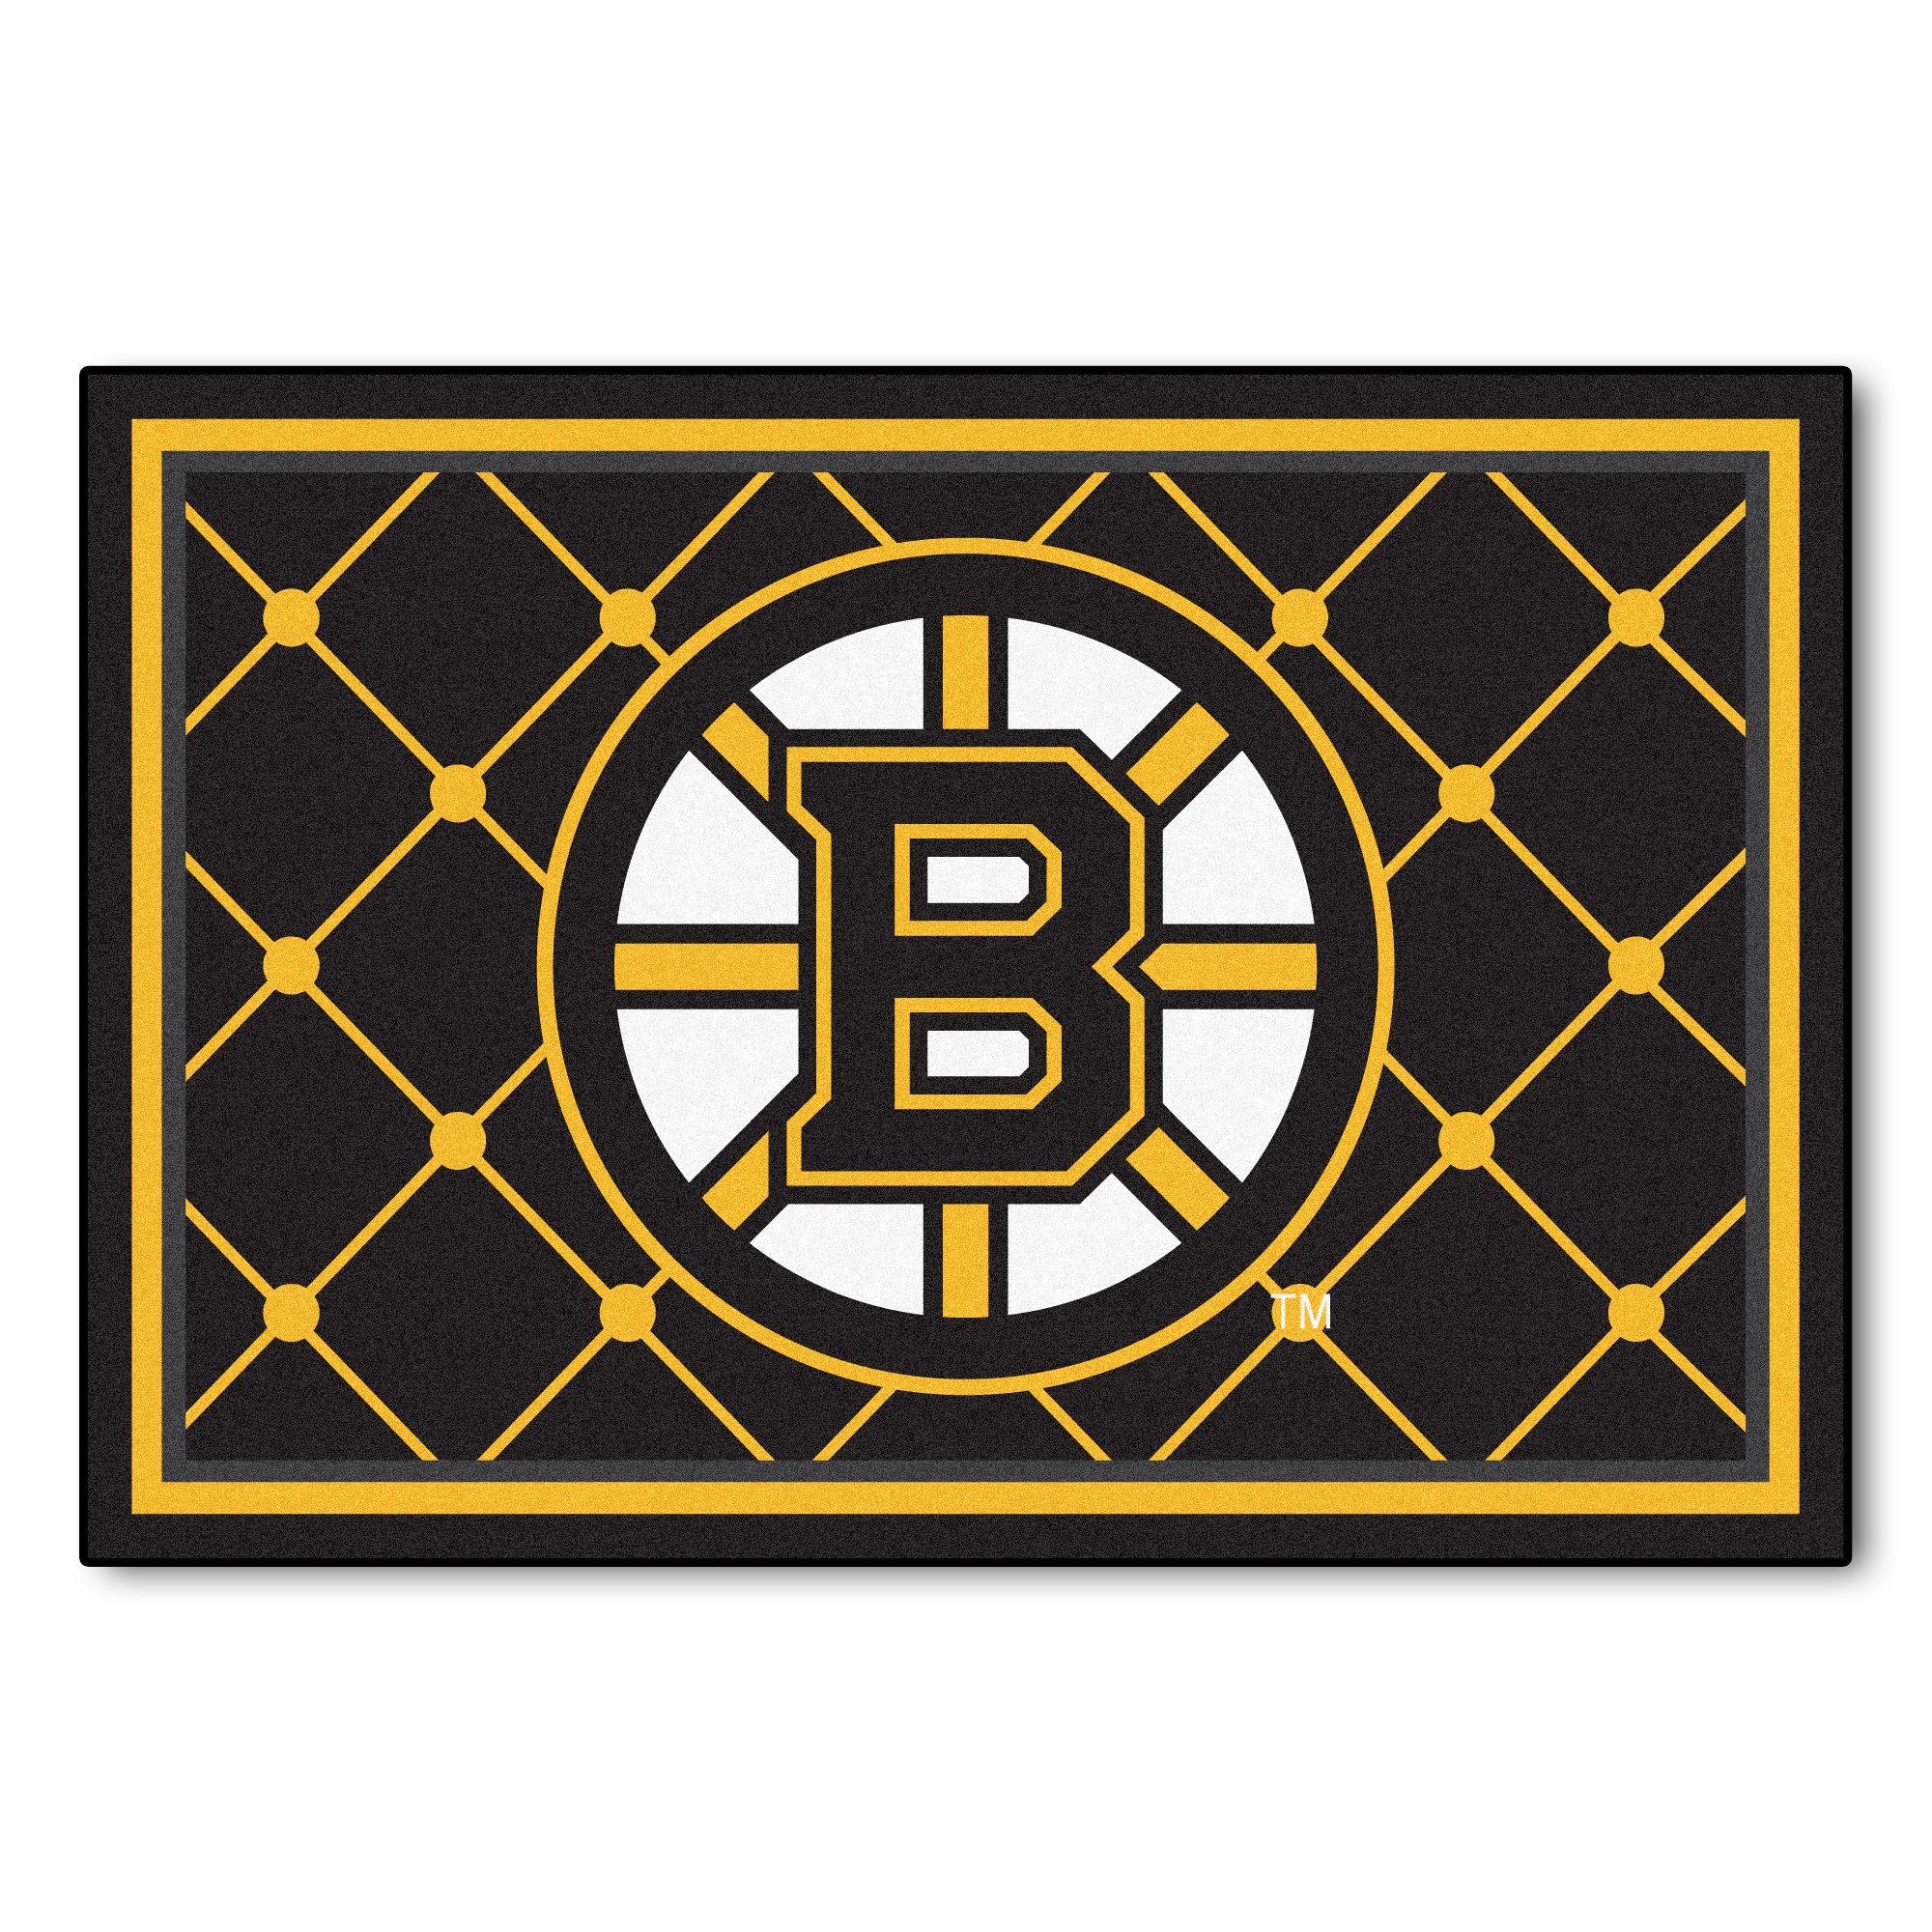 Fanmats Boston Bruins 5x8 Rug Reviews